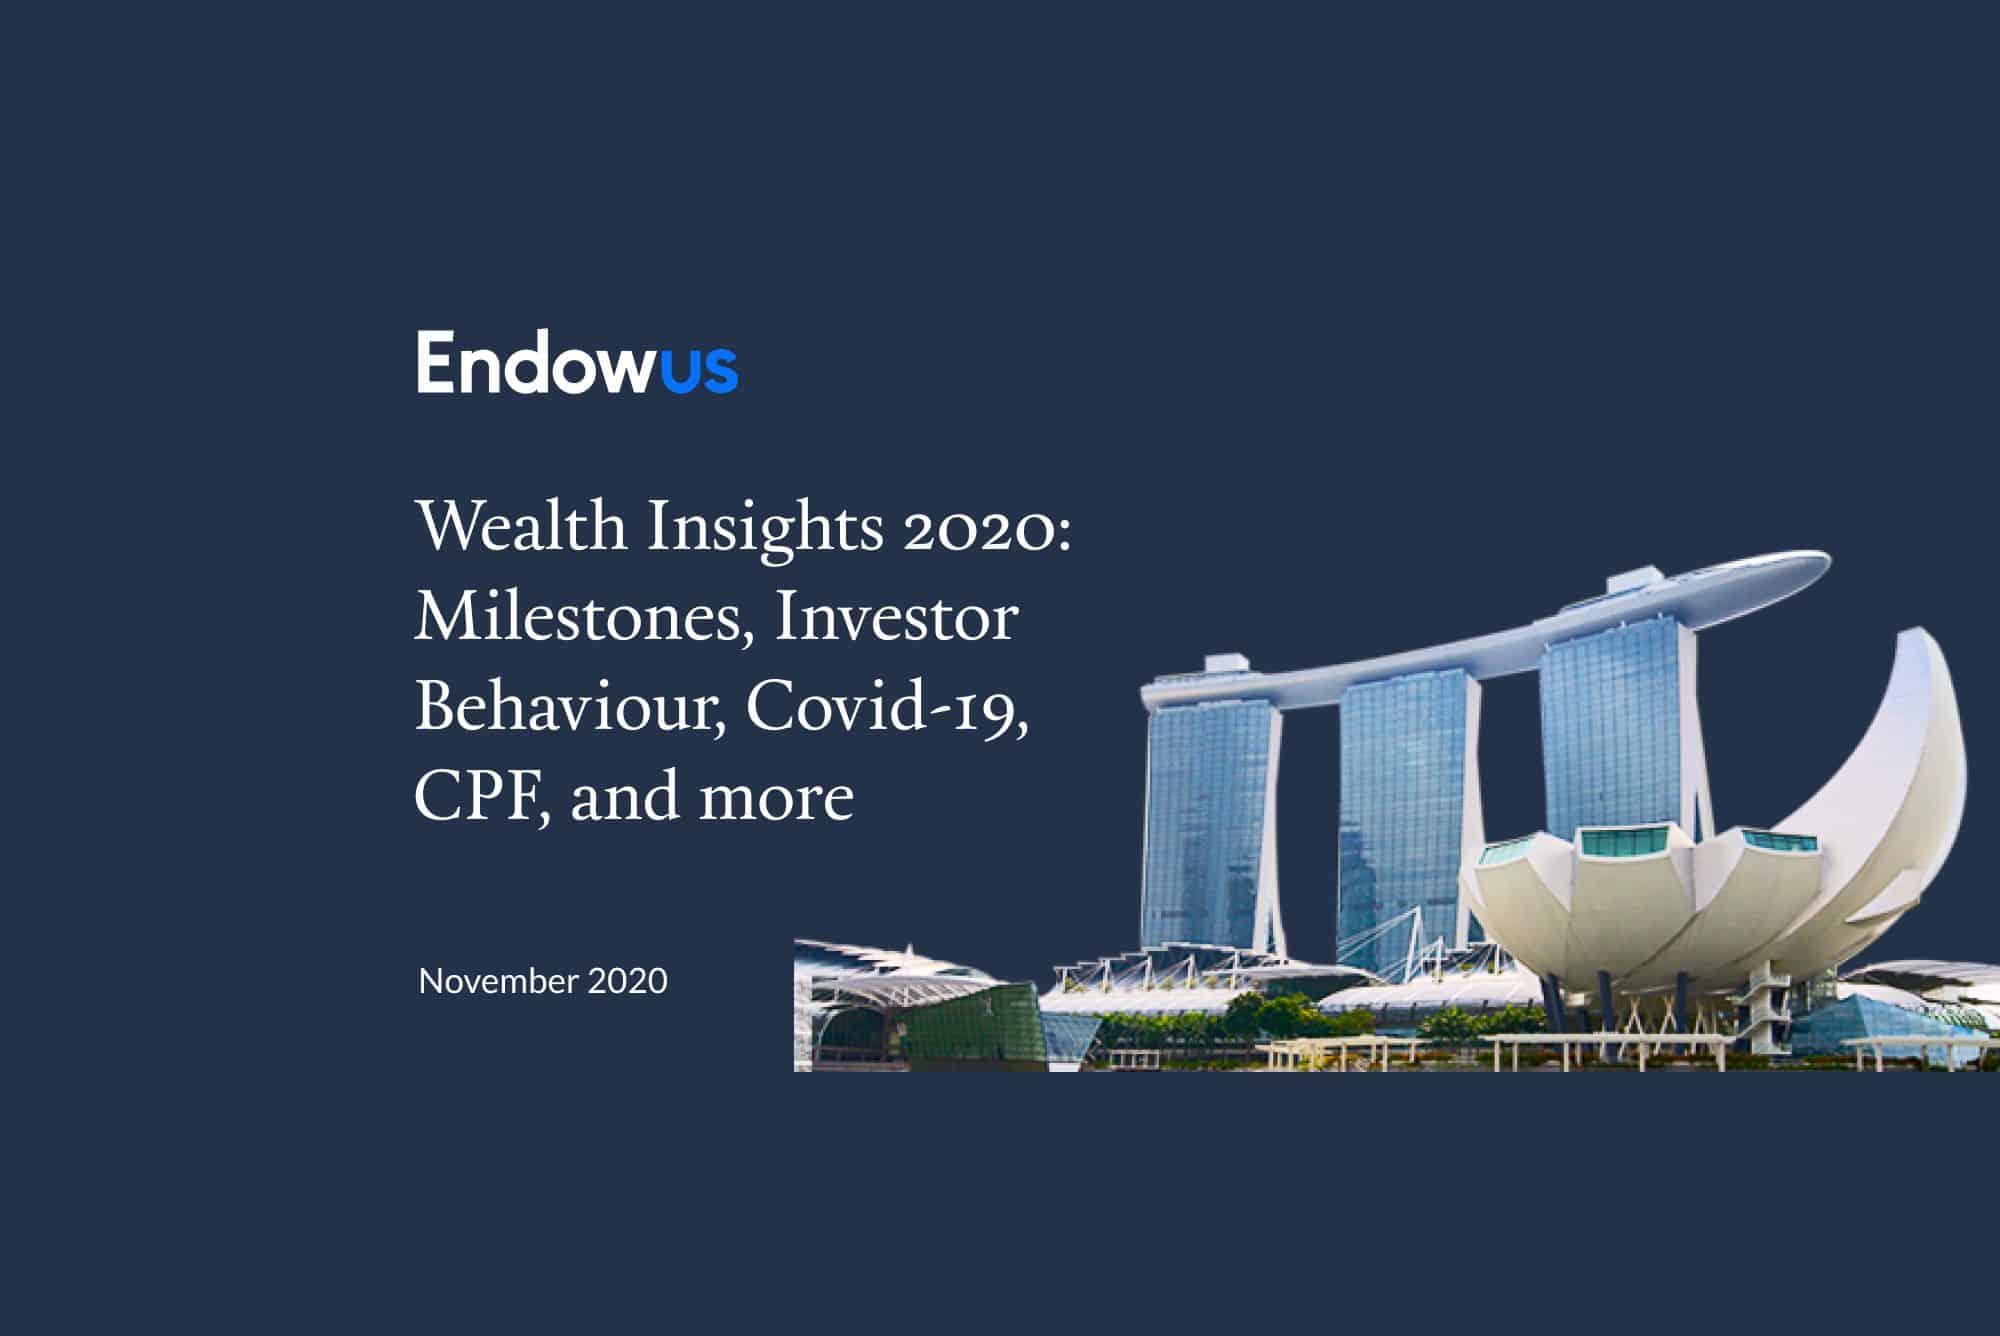 Endowus Wealth Insights 2020